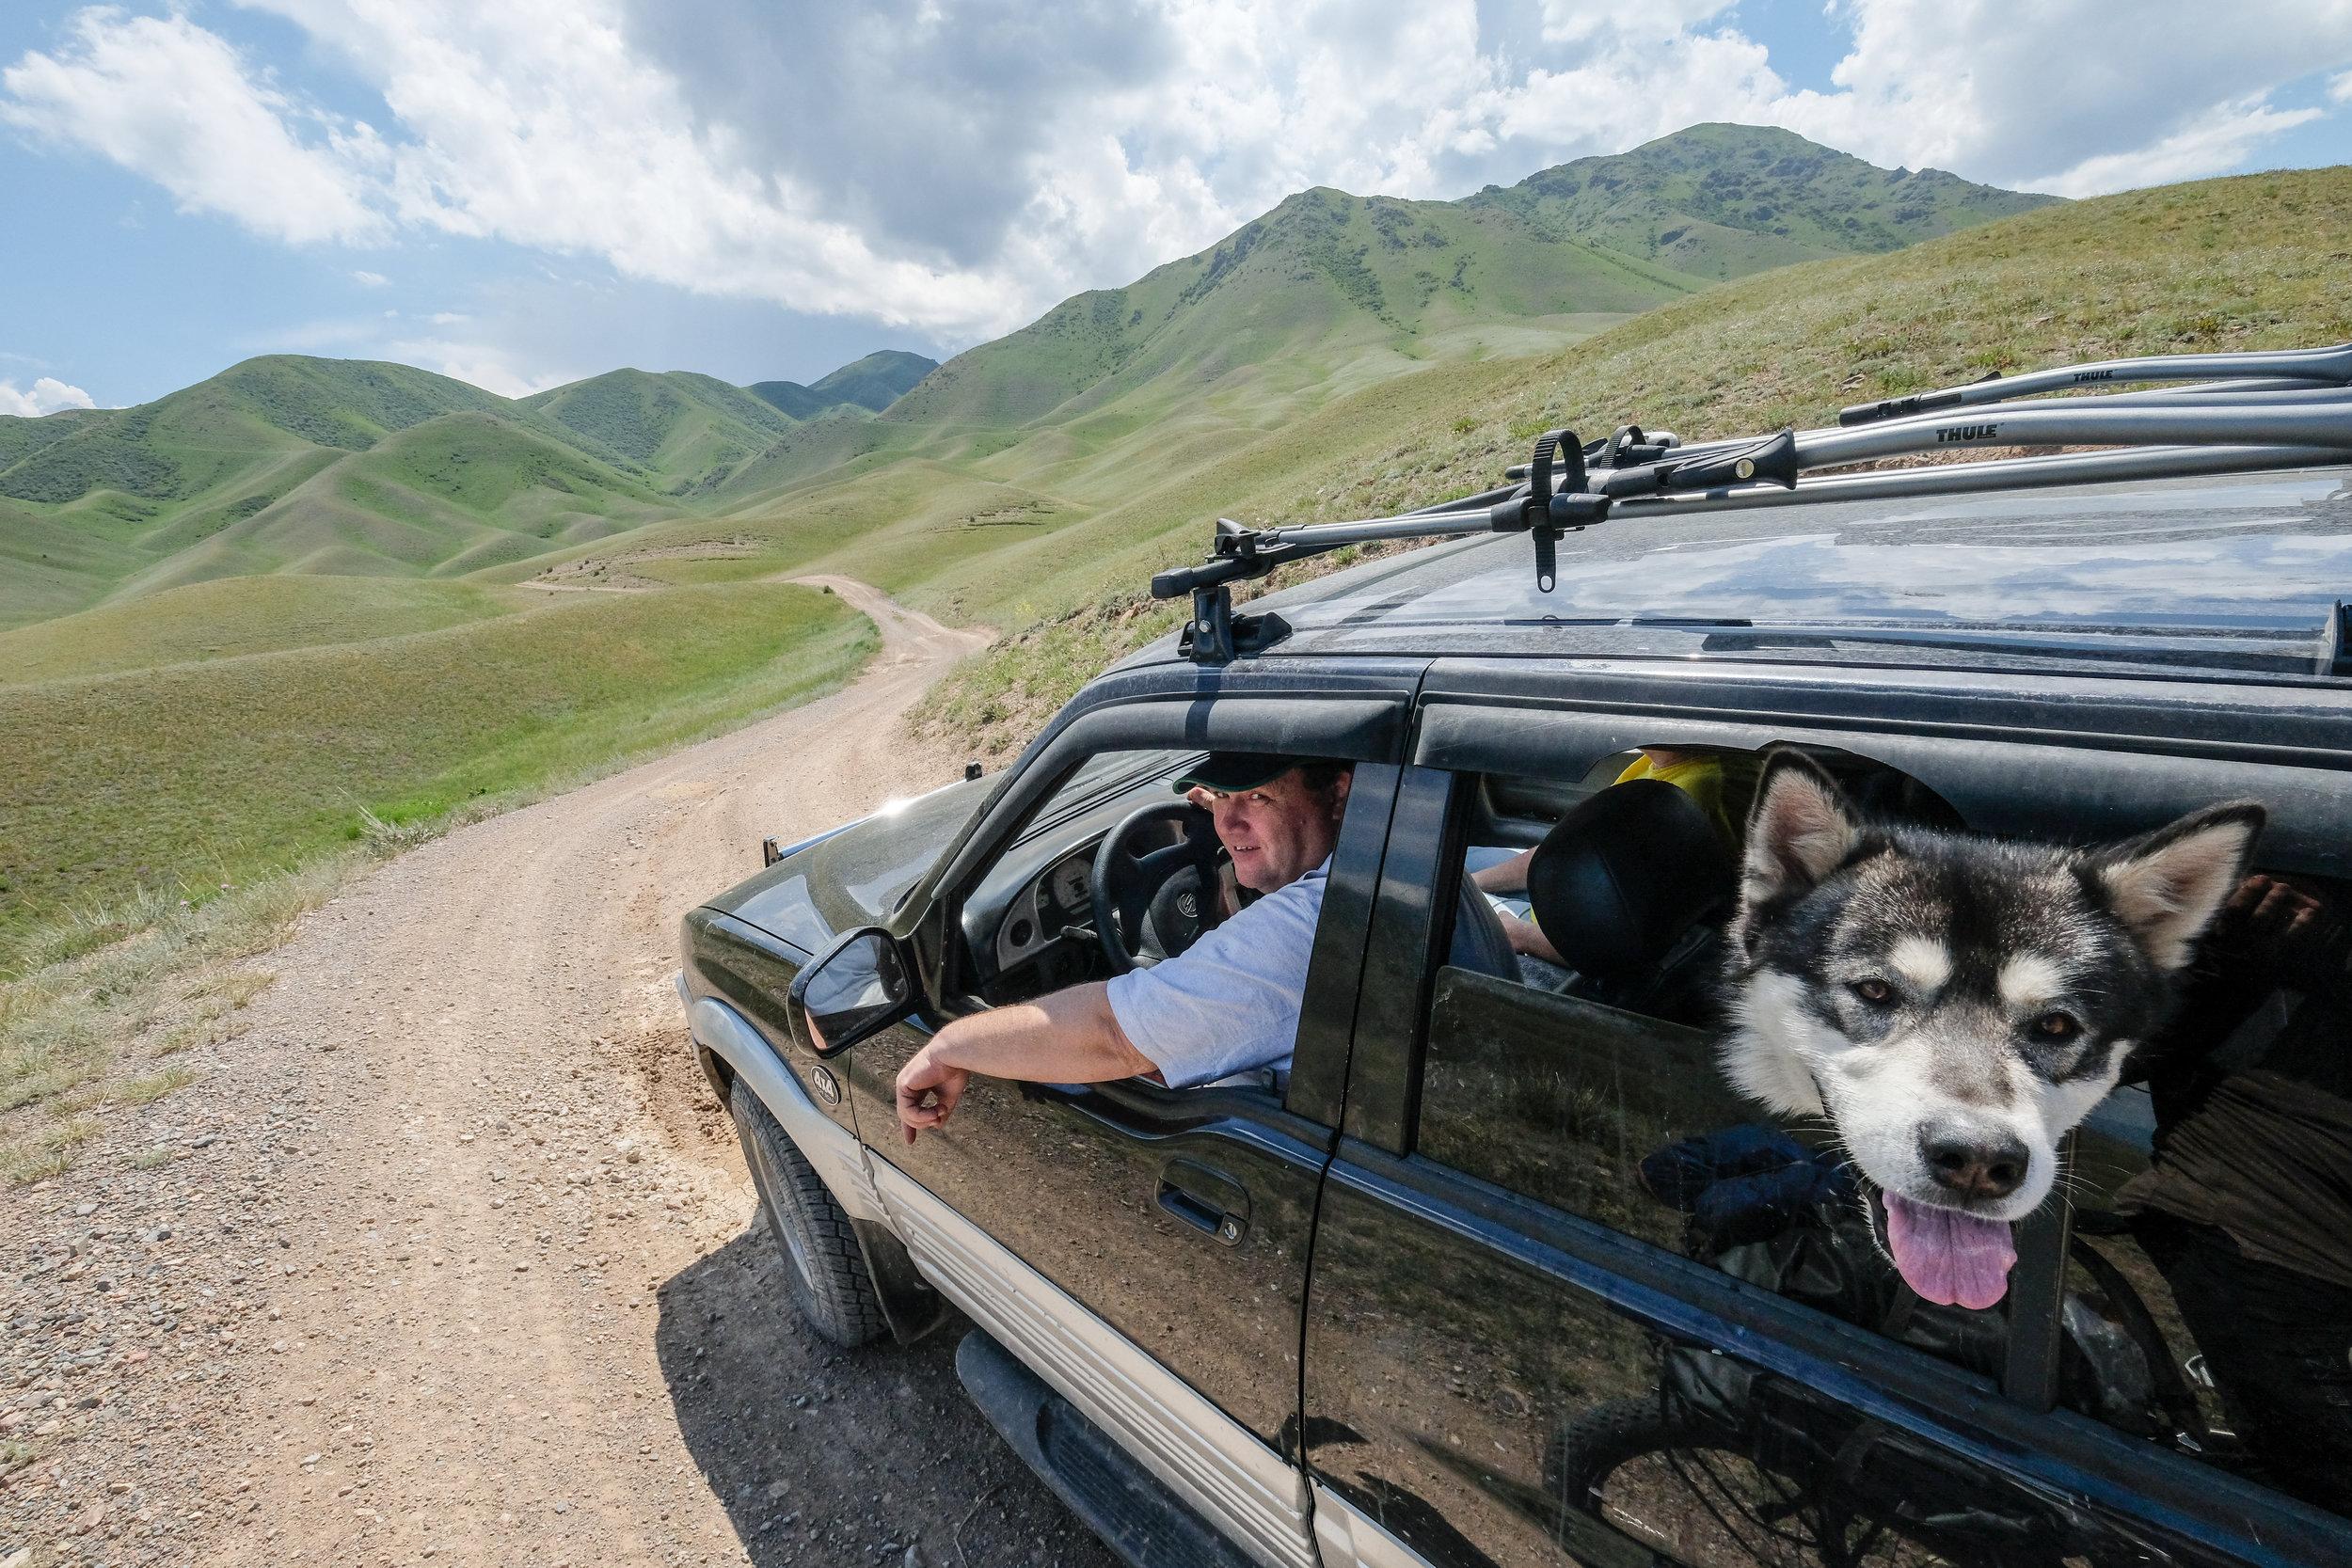 kazakh-corner-route-5095_35080811060_o.jpg